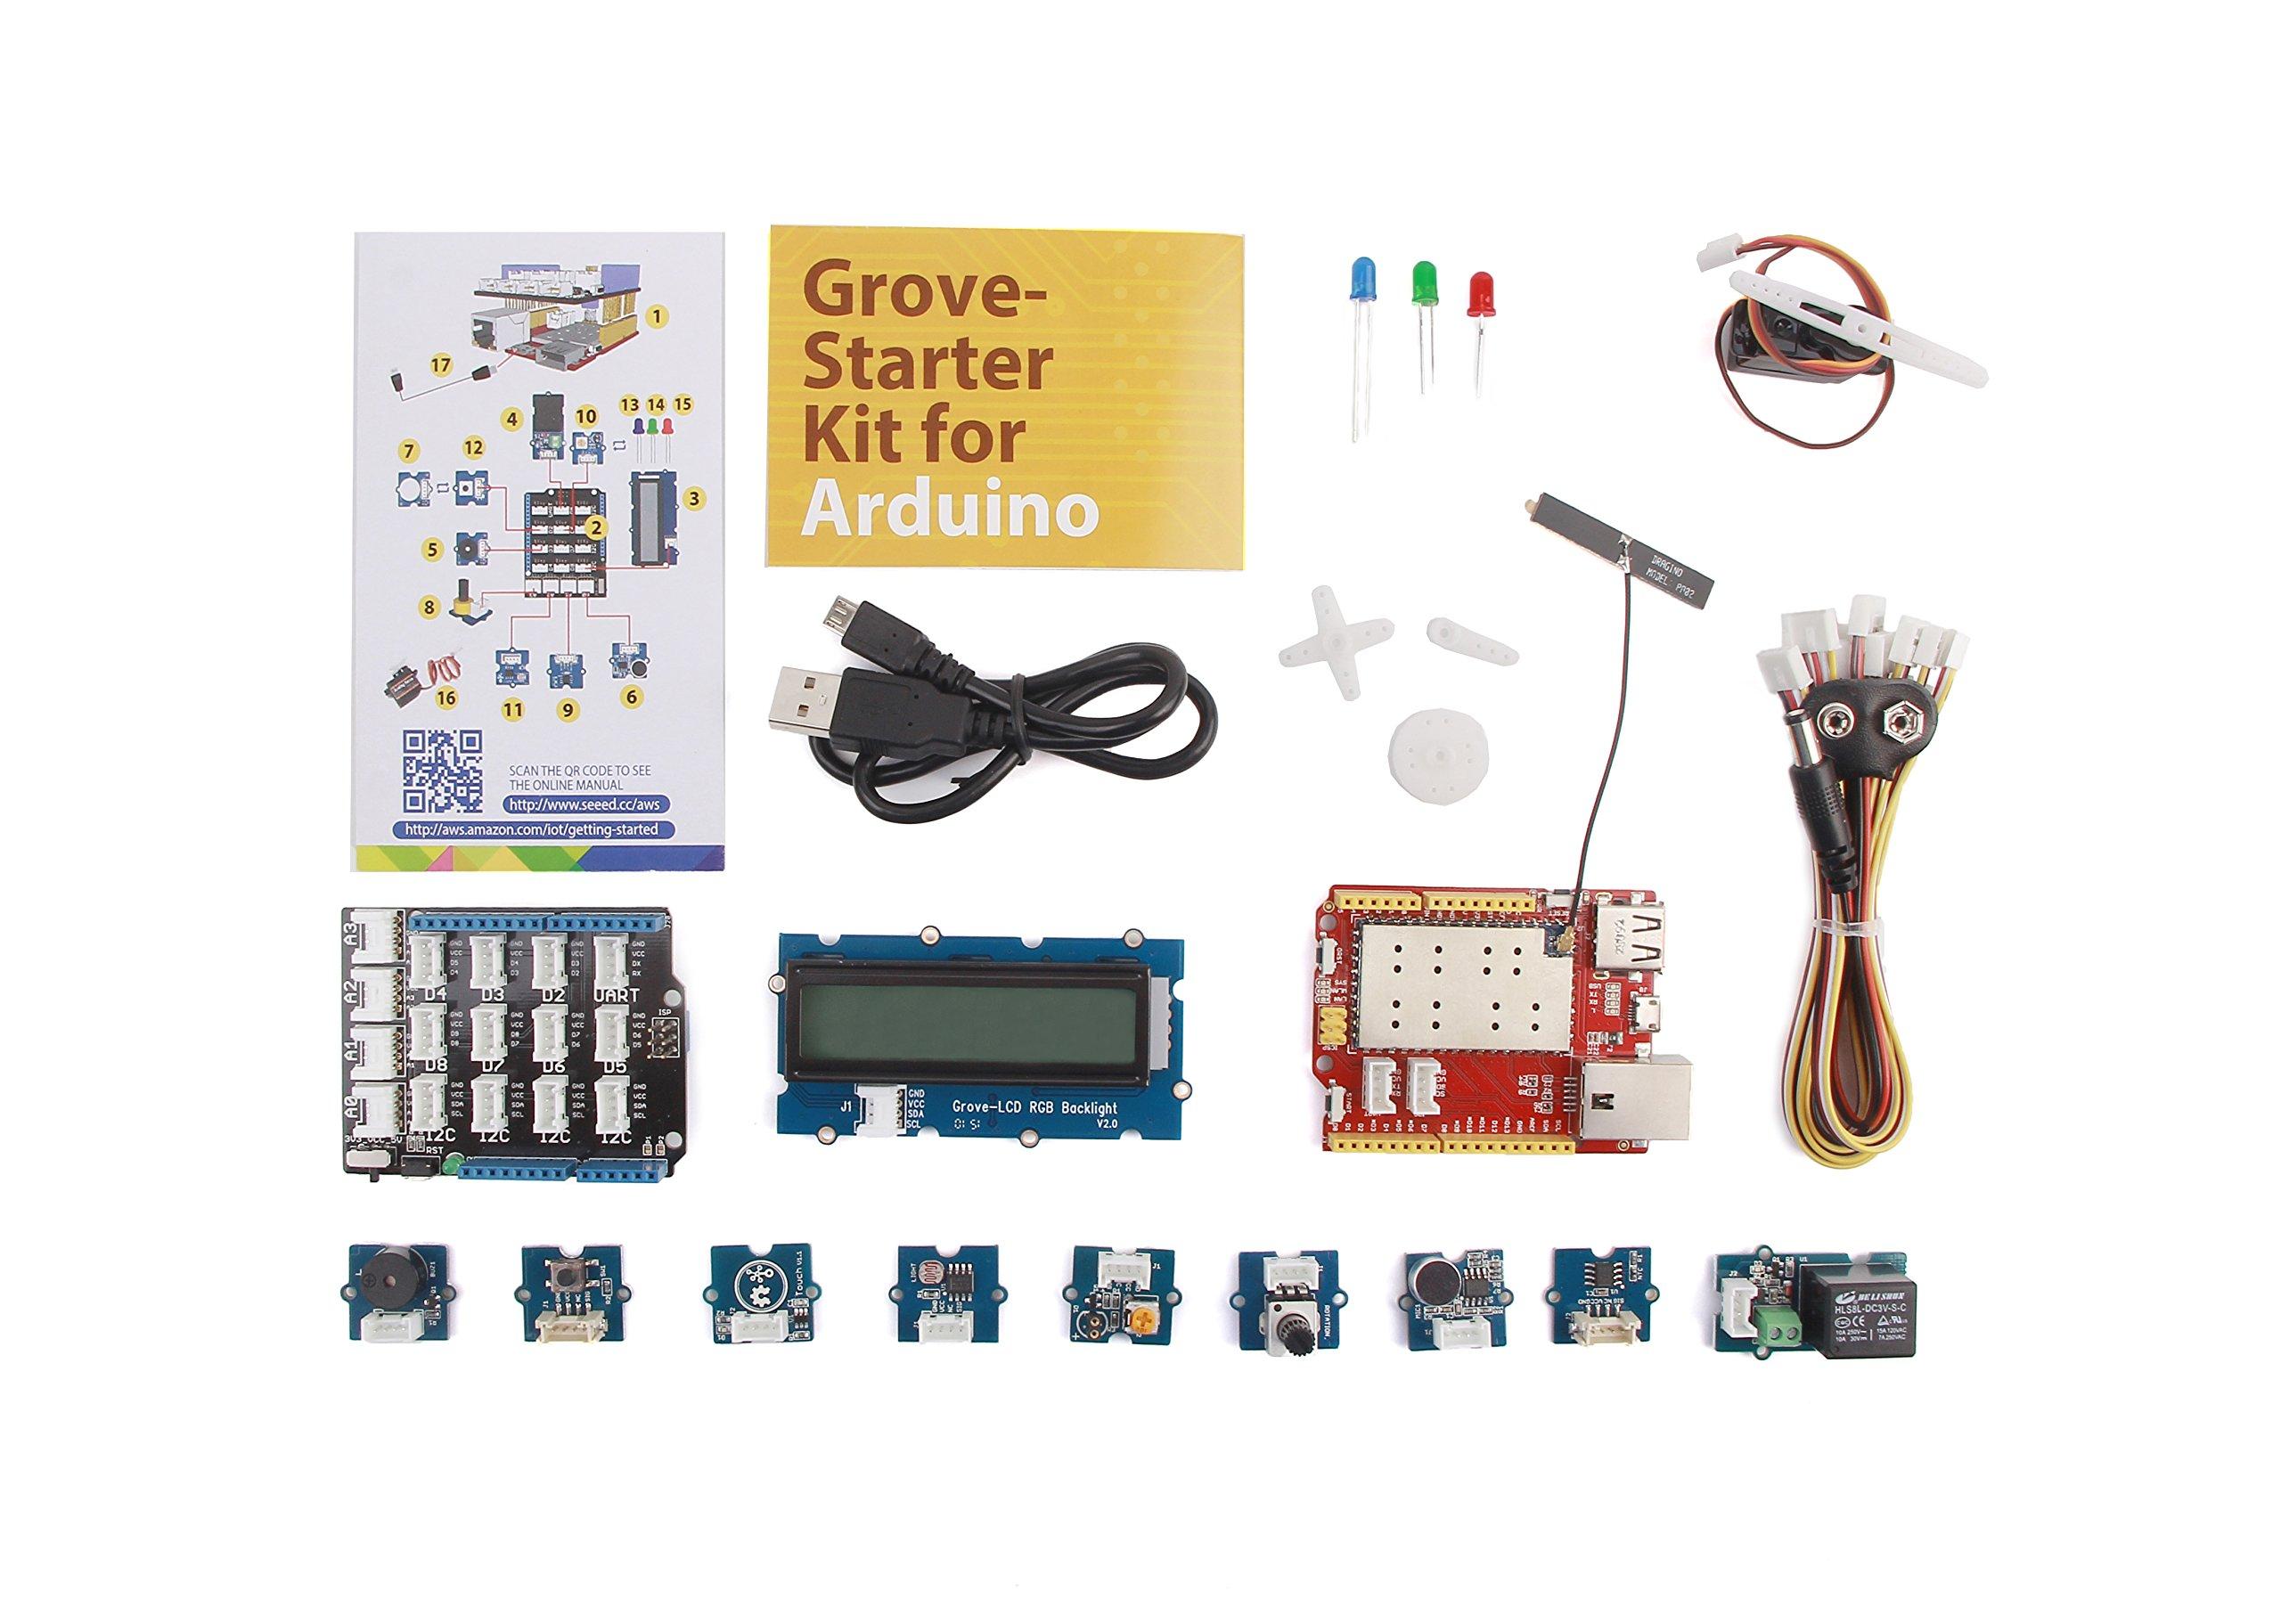 Seeeduino Cloud and Grove IoT Starter Kit Powered by AWS-Cloud Development Board-Sensorss